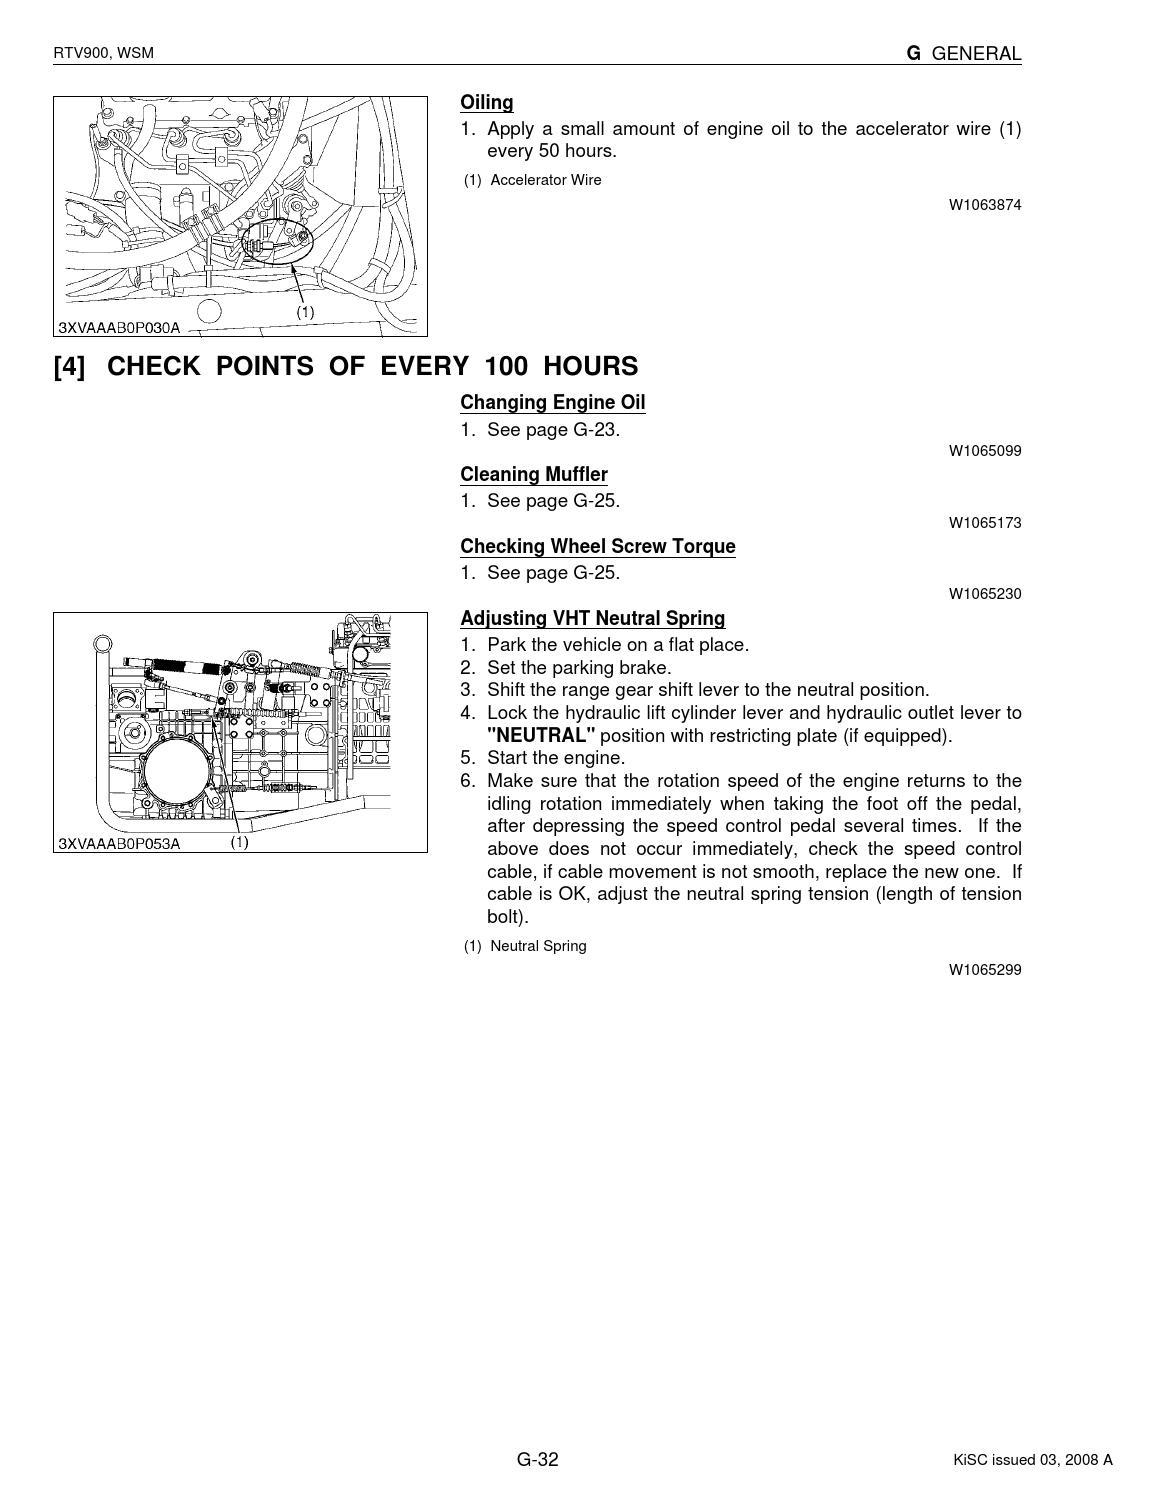 KUBOTA RTV900 UTILITY VEHICLE UTV Service Repair Manual by